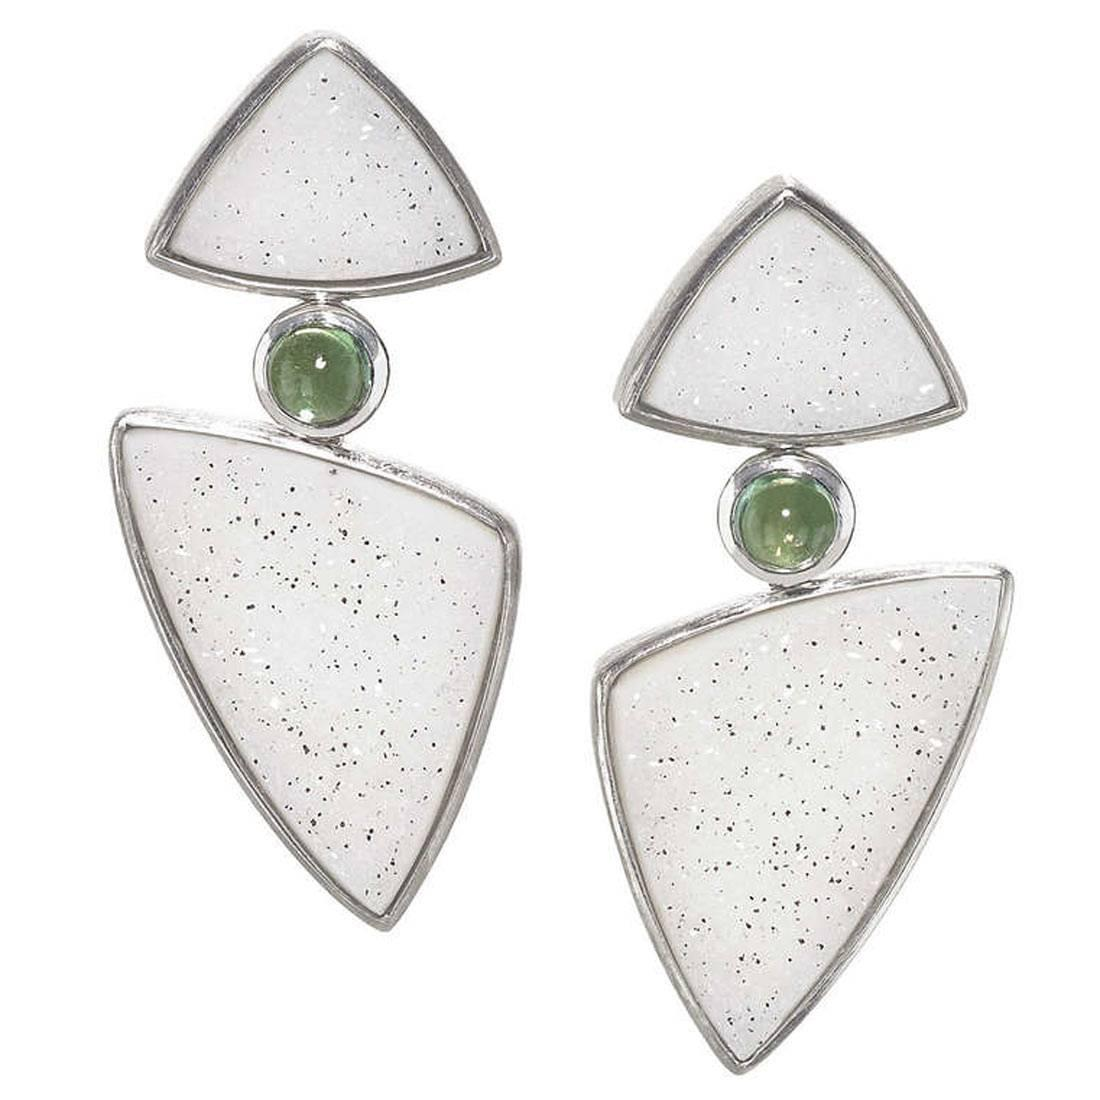 Antonio Bernardo Brazil Shimmering Druzy Agate Green Tourmaline Dangle Earring